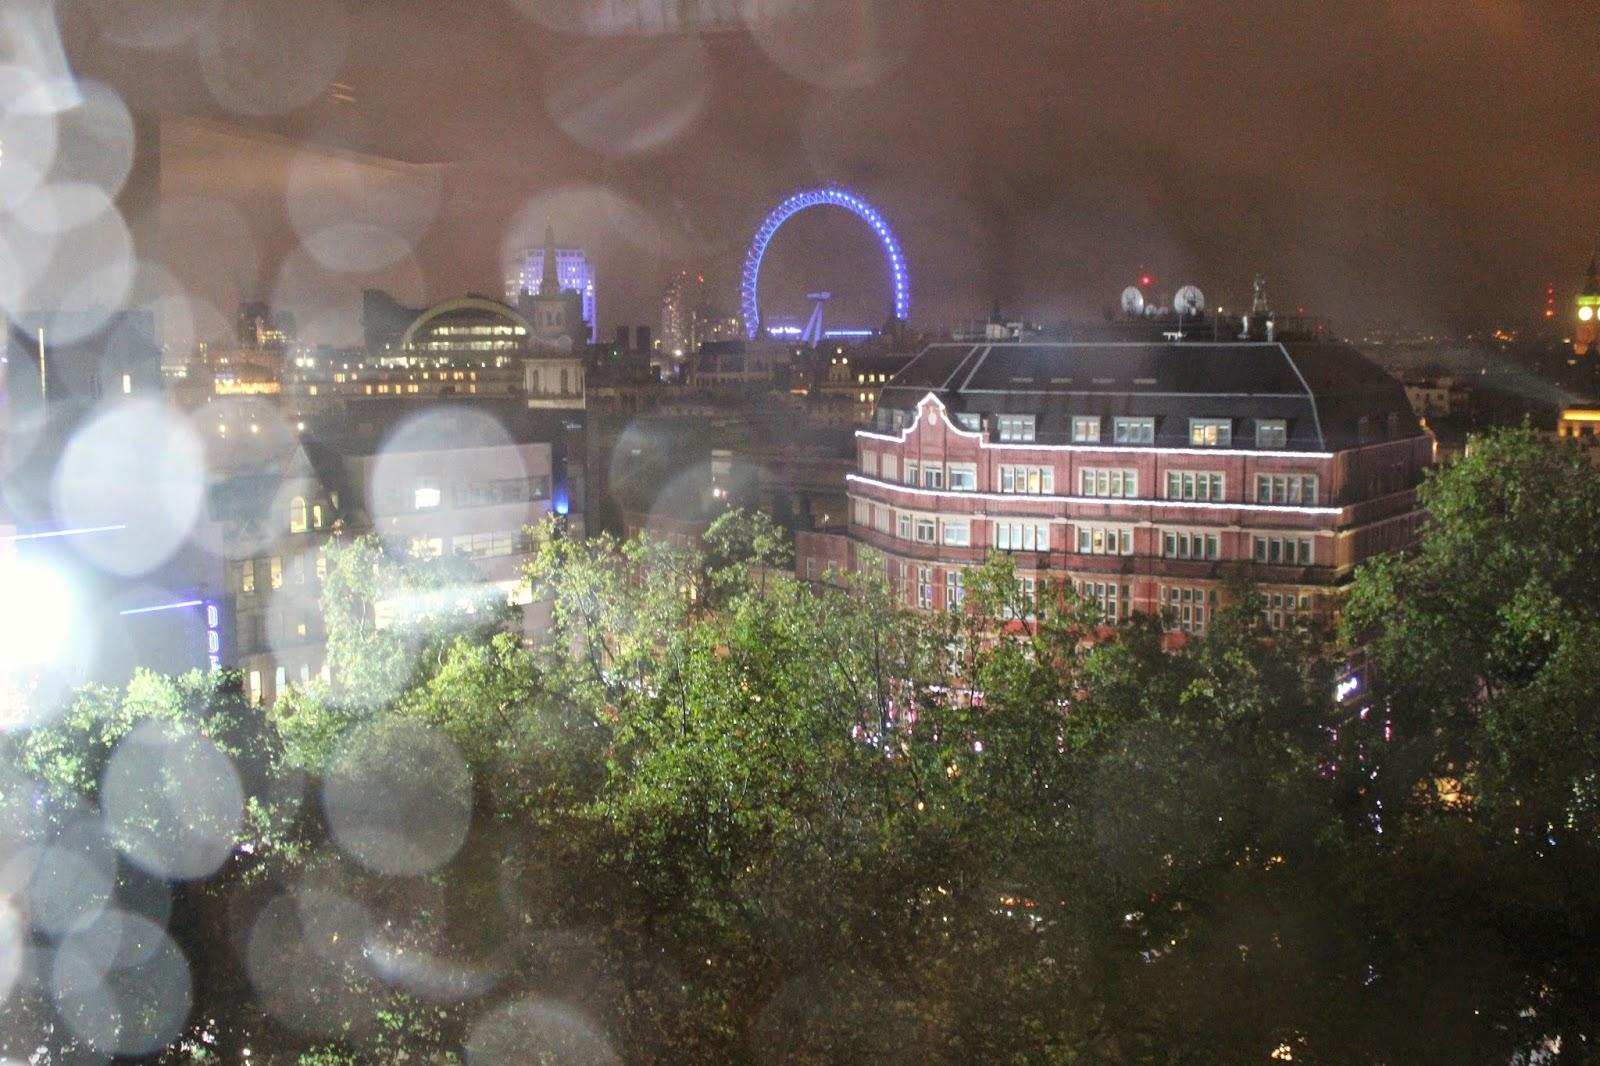 bloggers-love-fashion-week-london-skyline-night